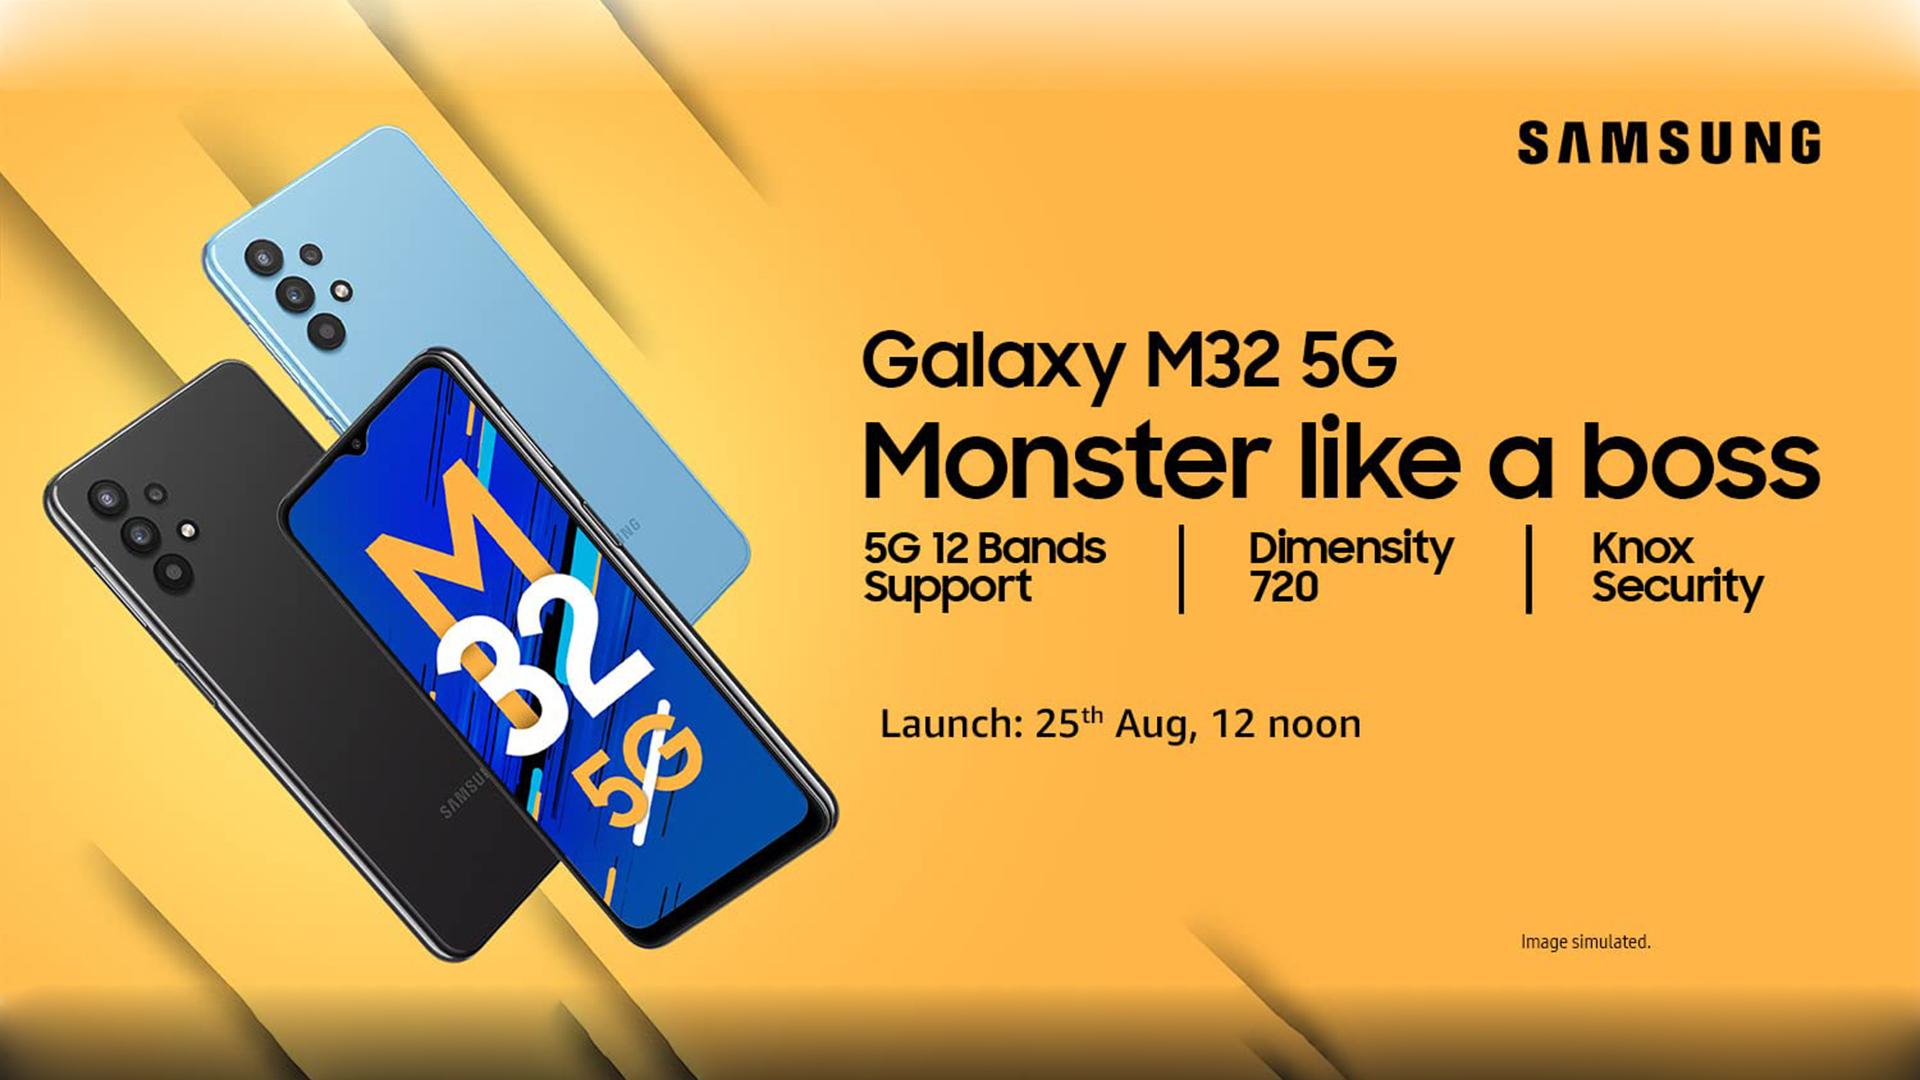 Samsung Galaxy M32 5G Amazon teaser